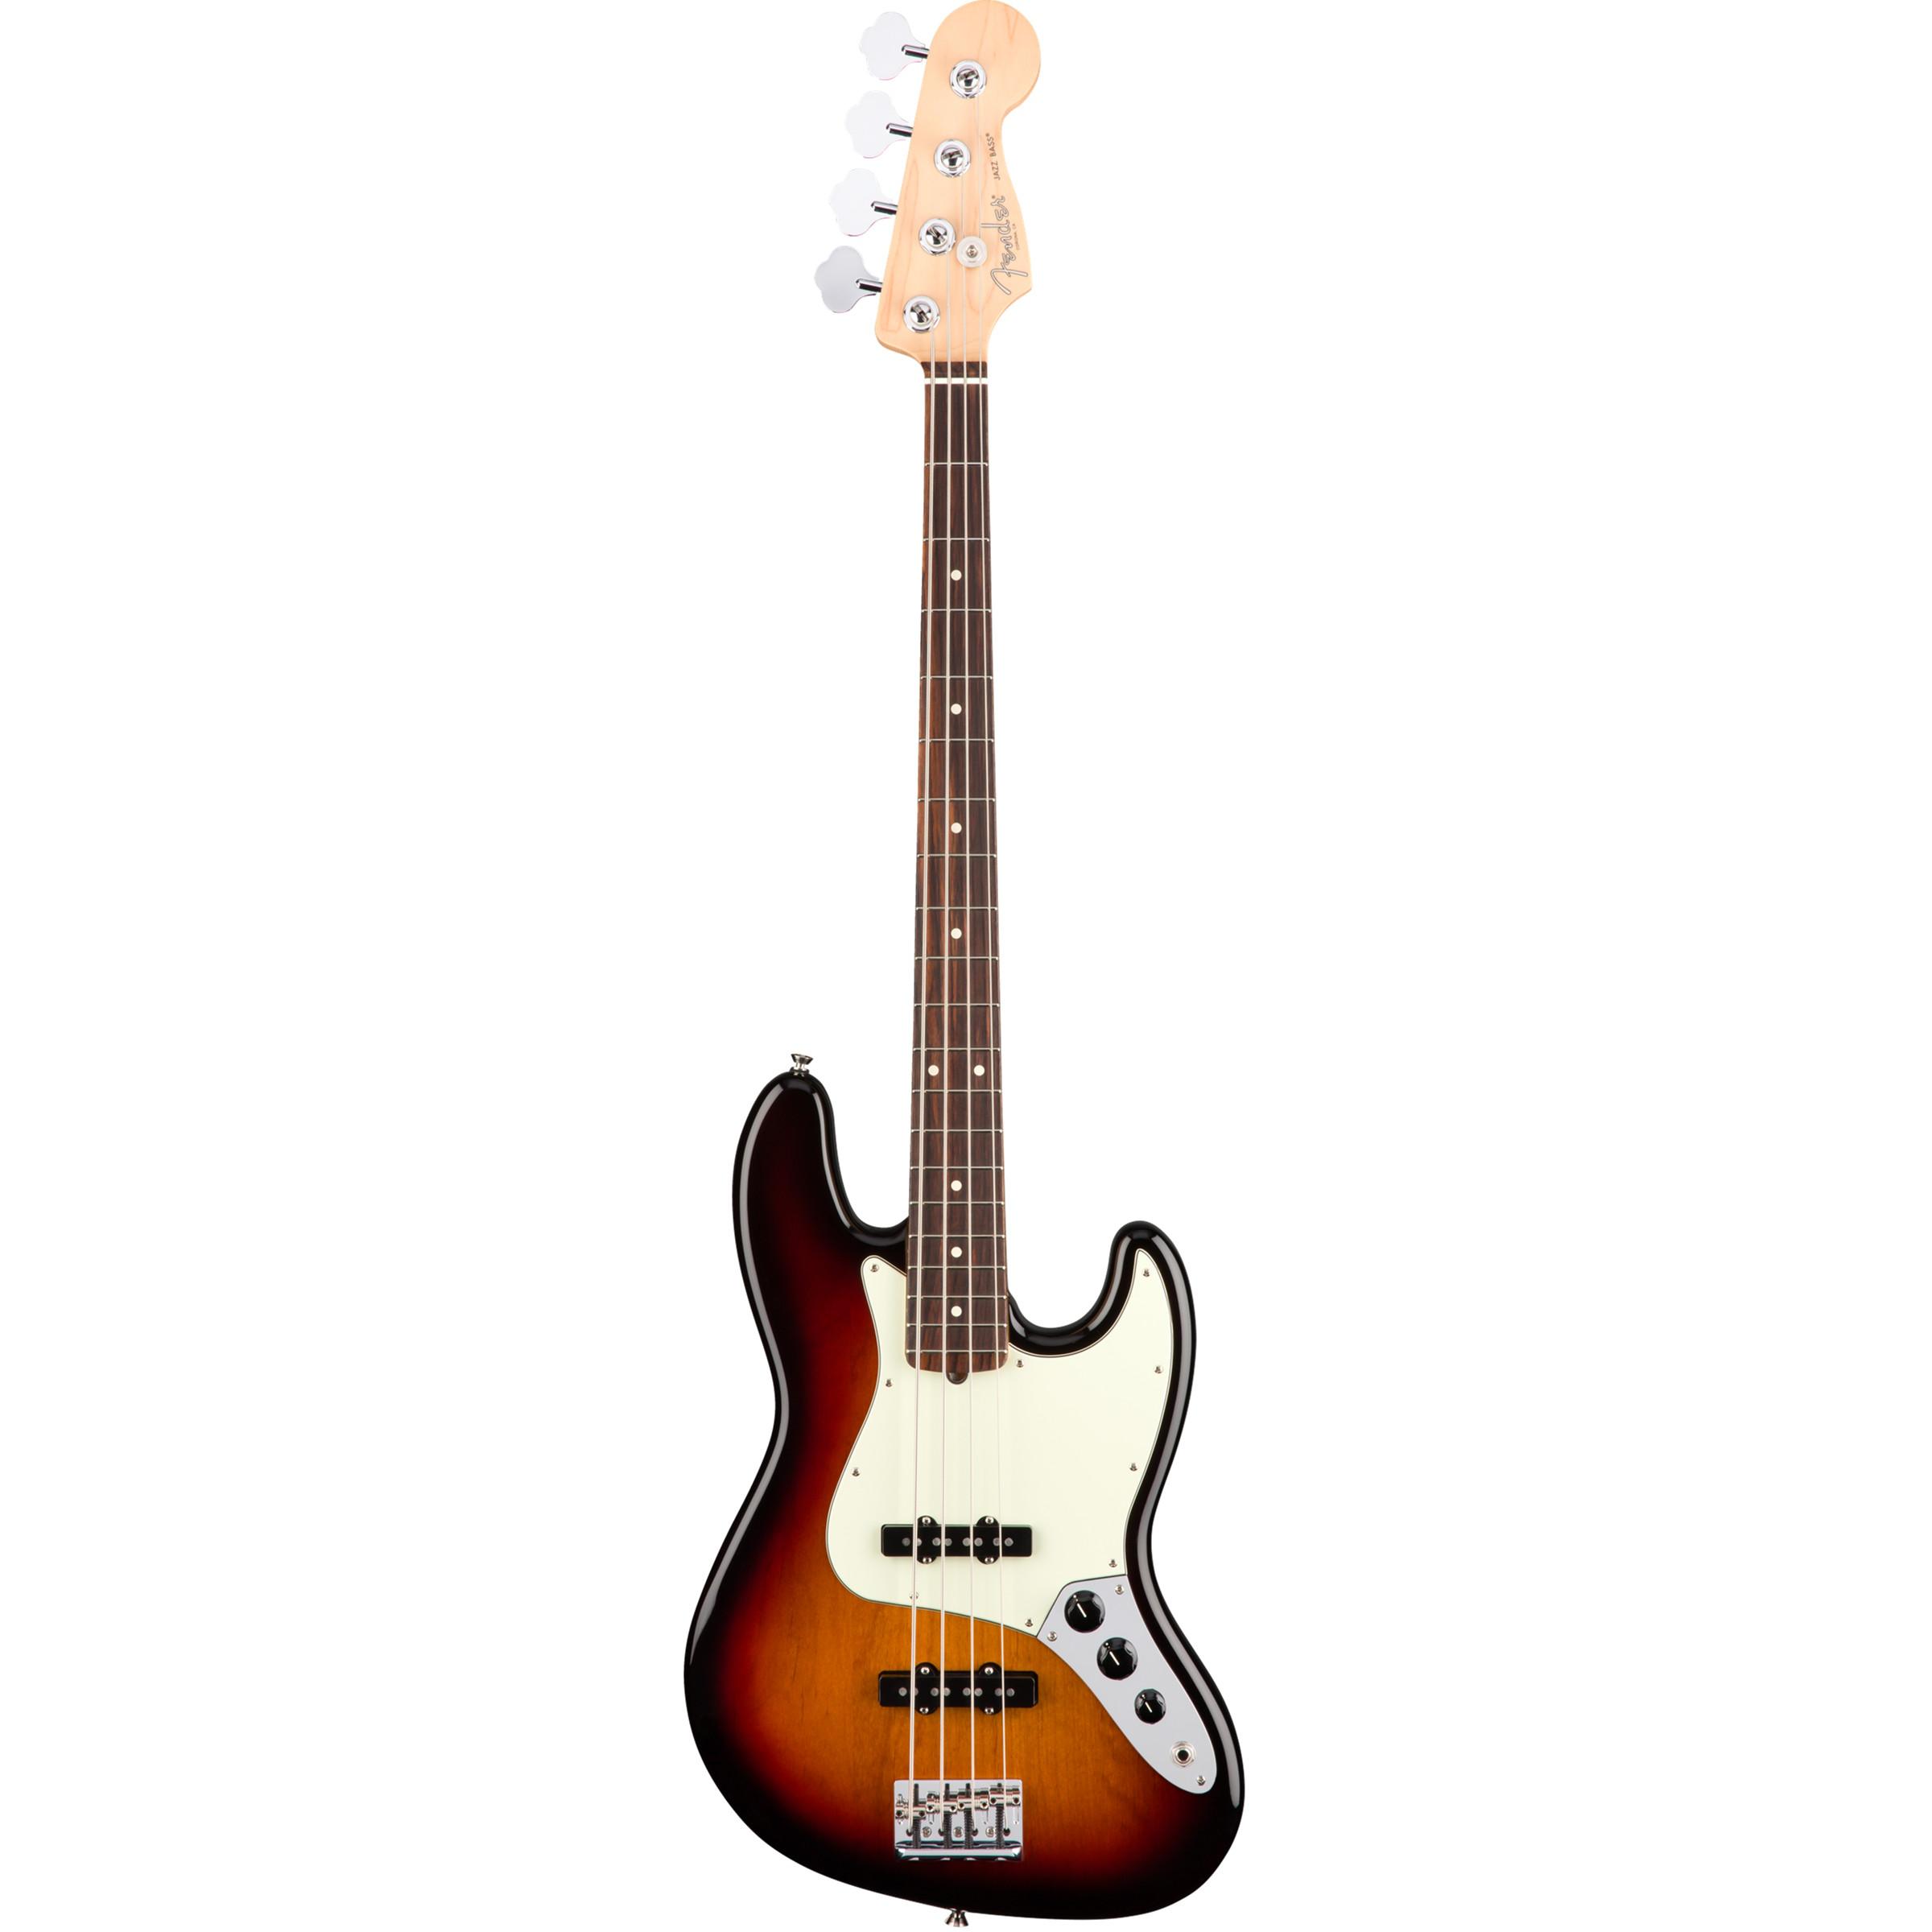 Fender American Pro Jazz Bass RW 3-Color Sunburst